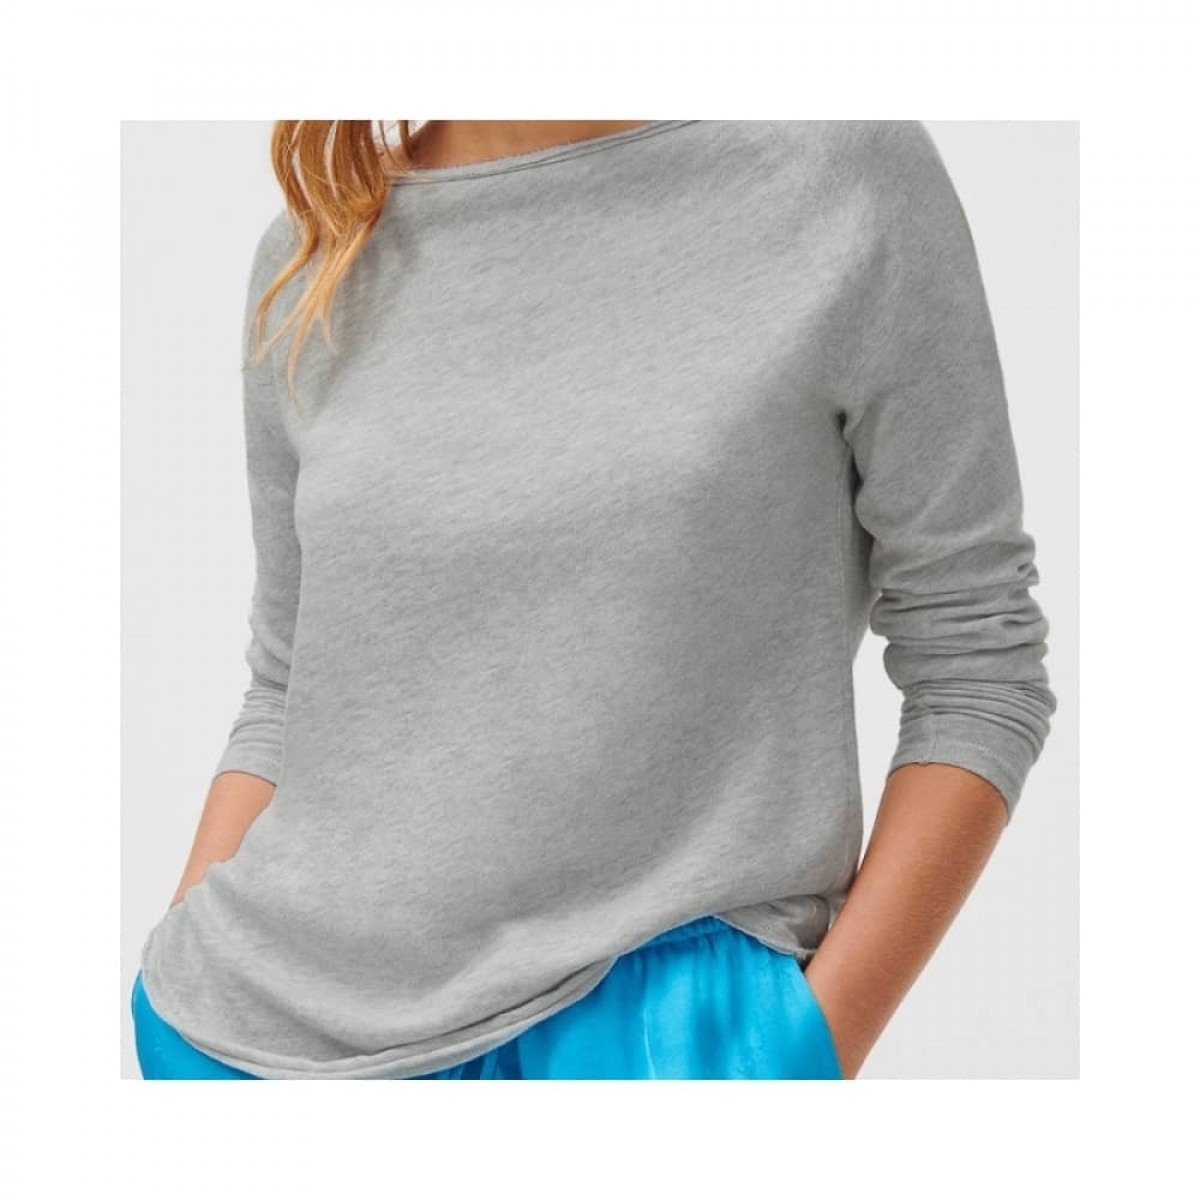 sonoma bluse - heather grey